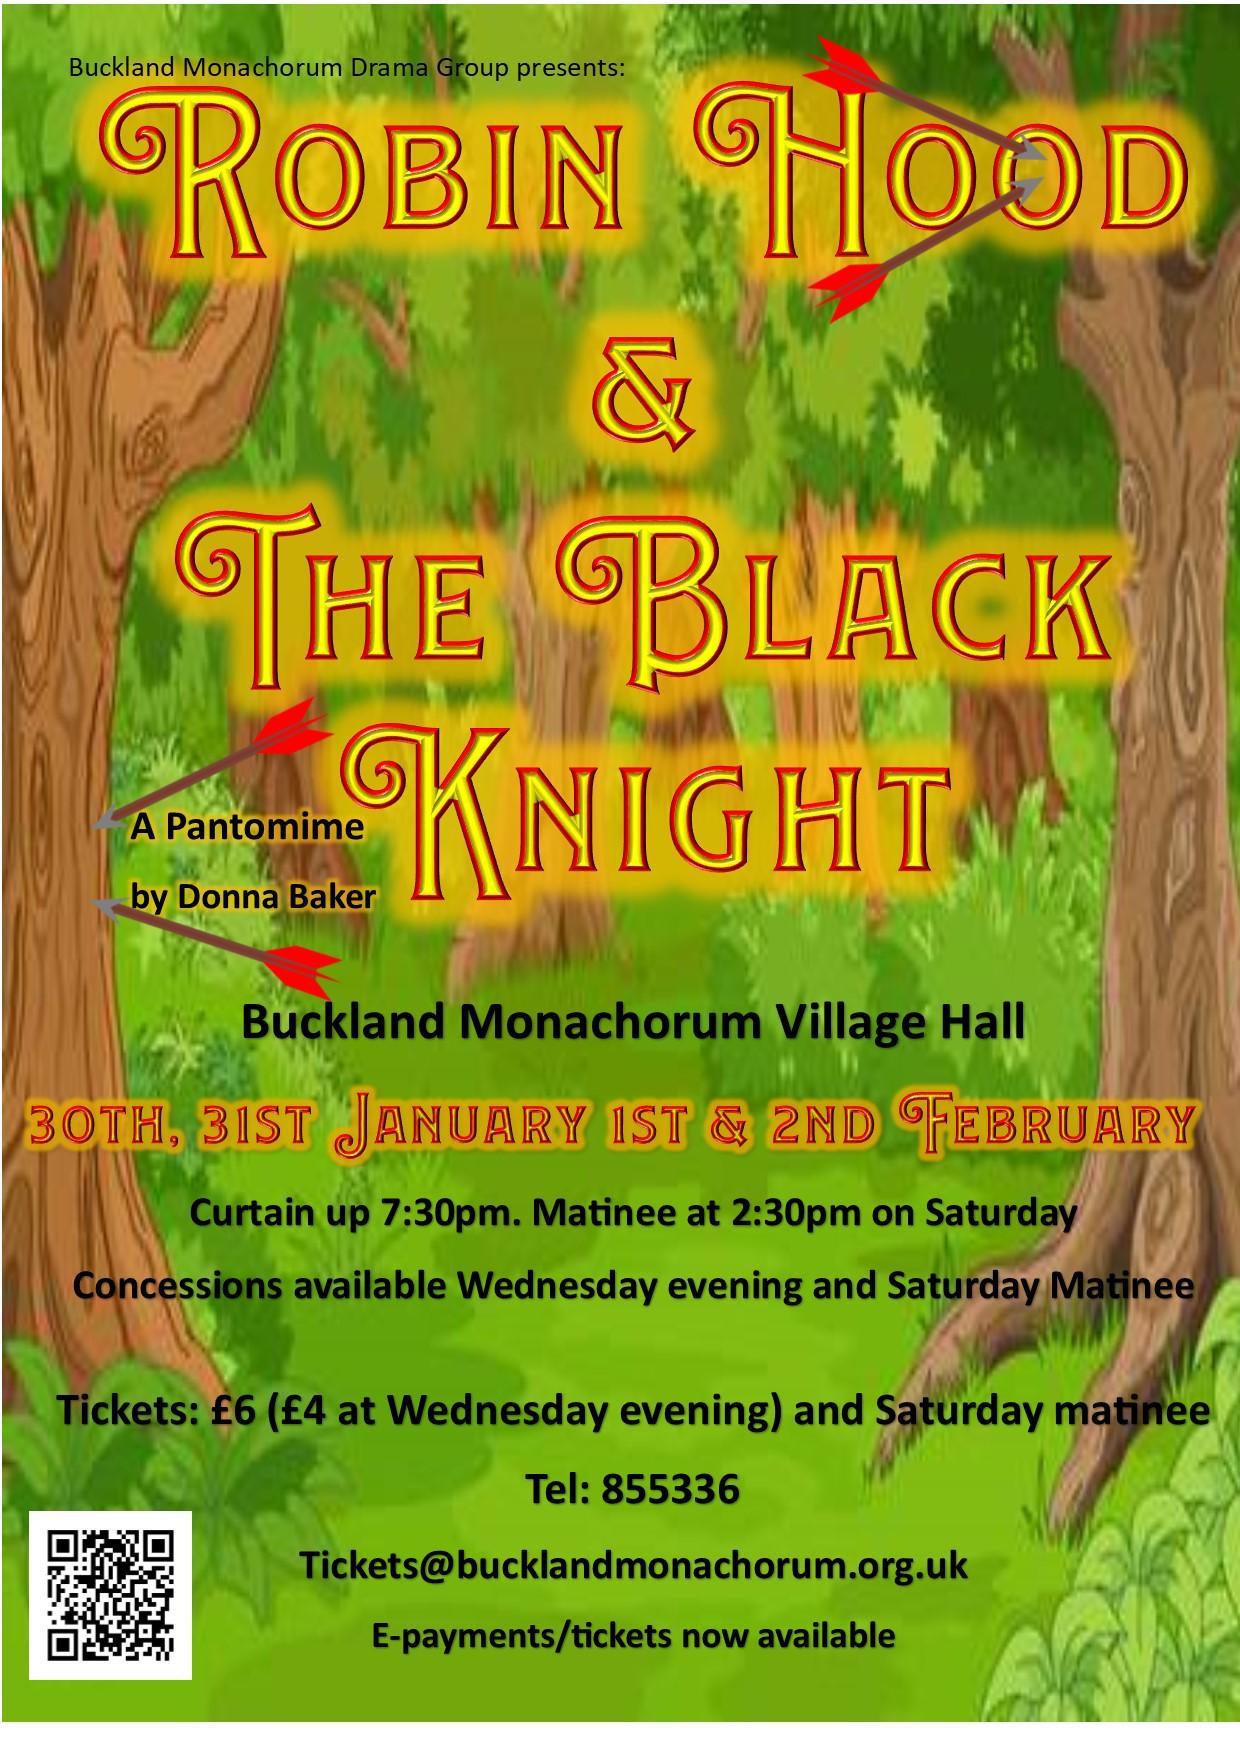 Robin Hood & the Black Knight – Buckland Monachorum Drama Group